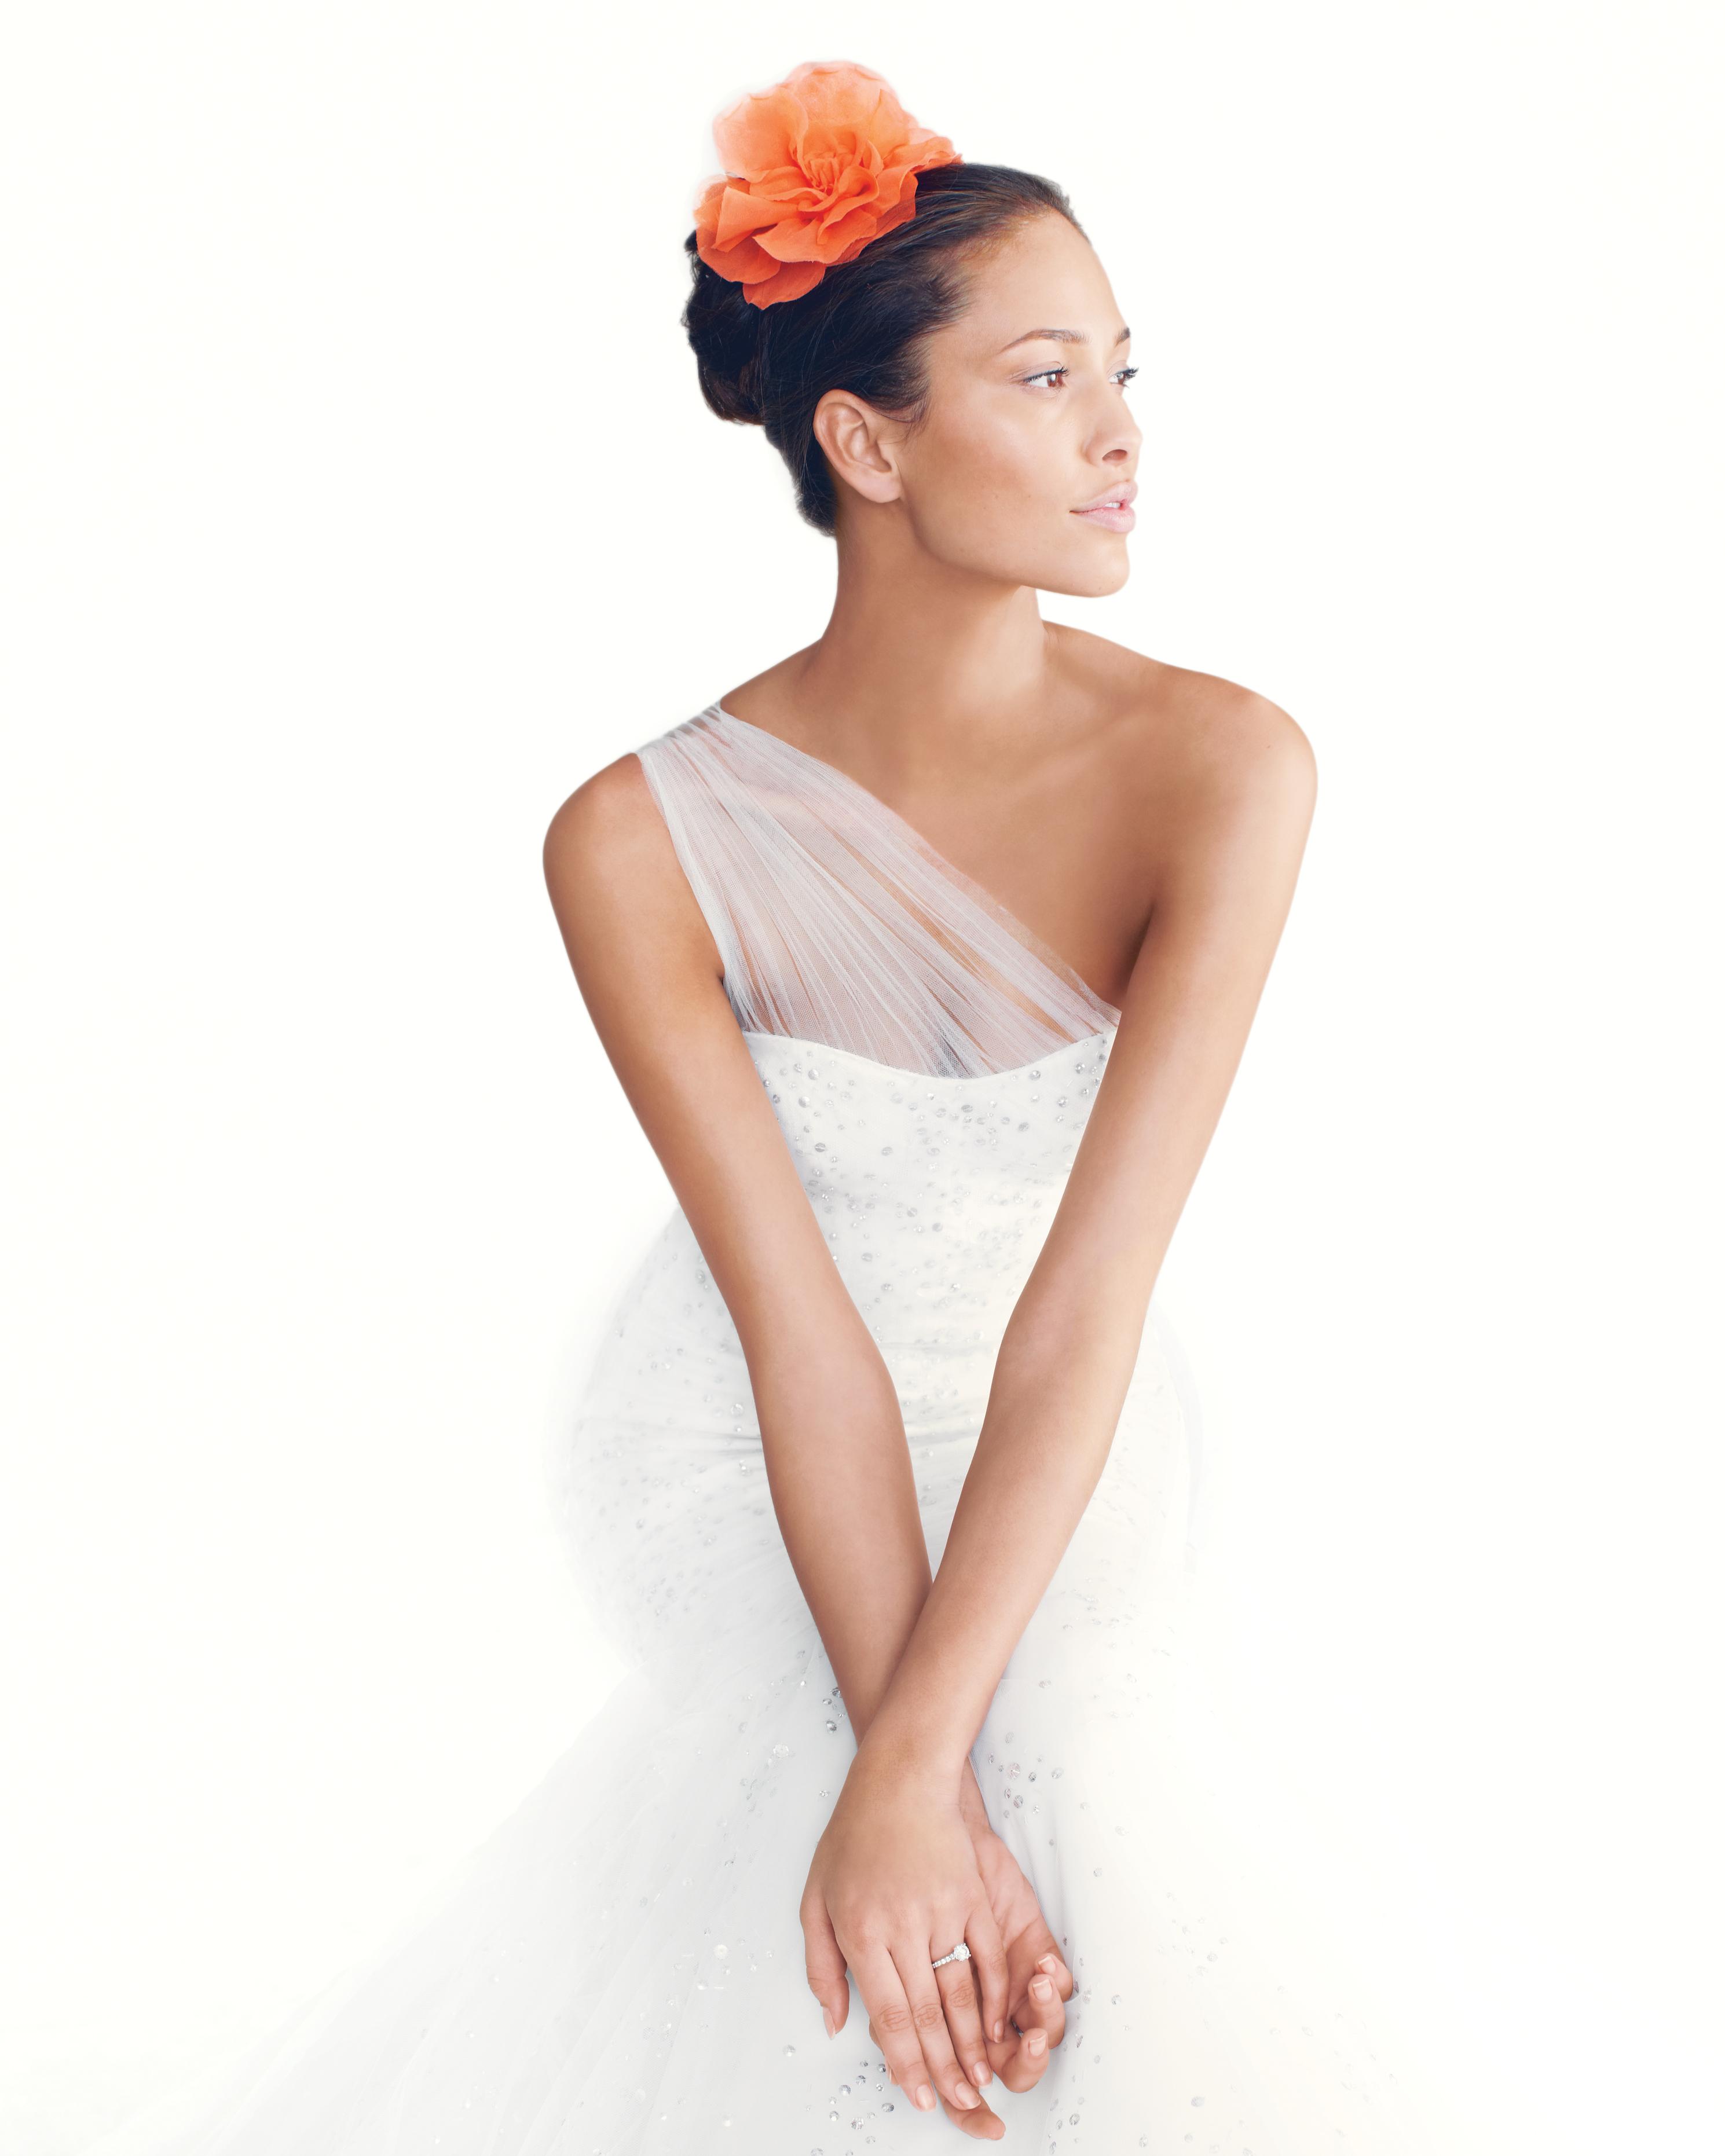 wedding-dress-lookj-0399-wd107397.jpg